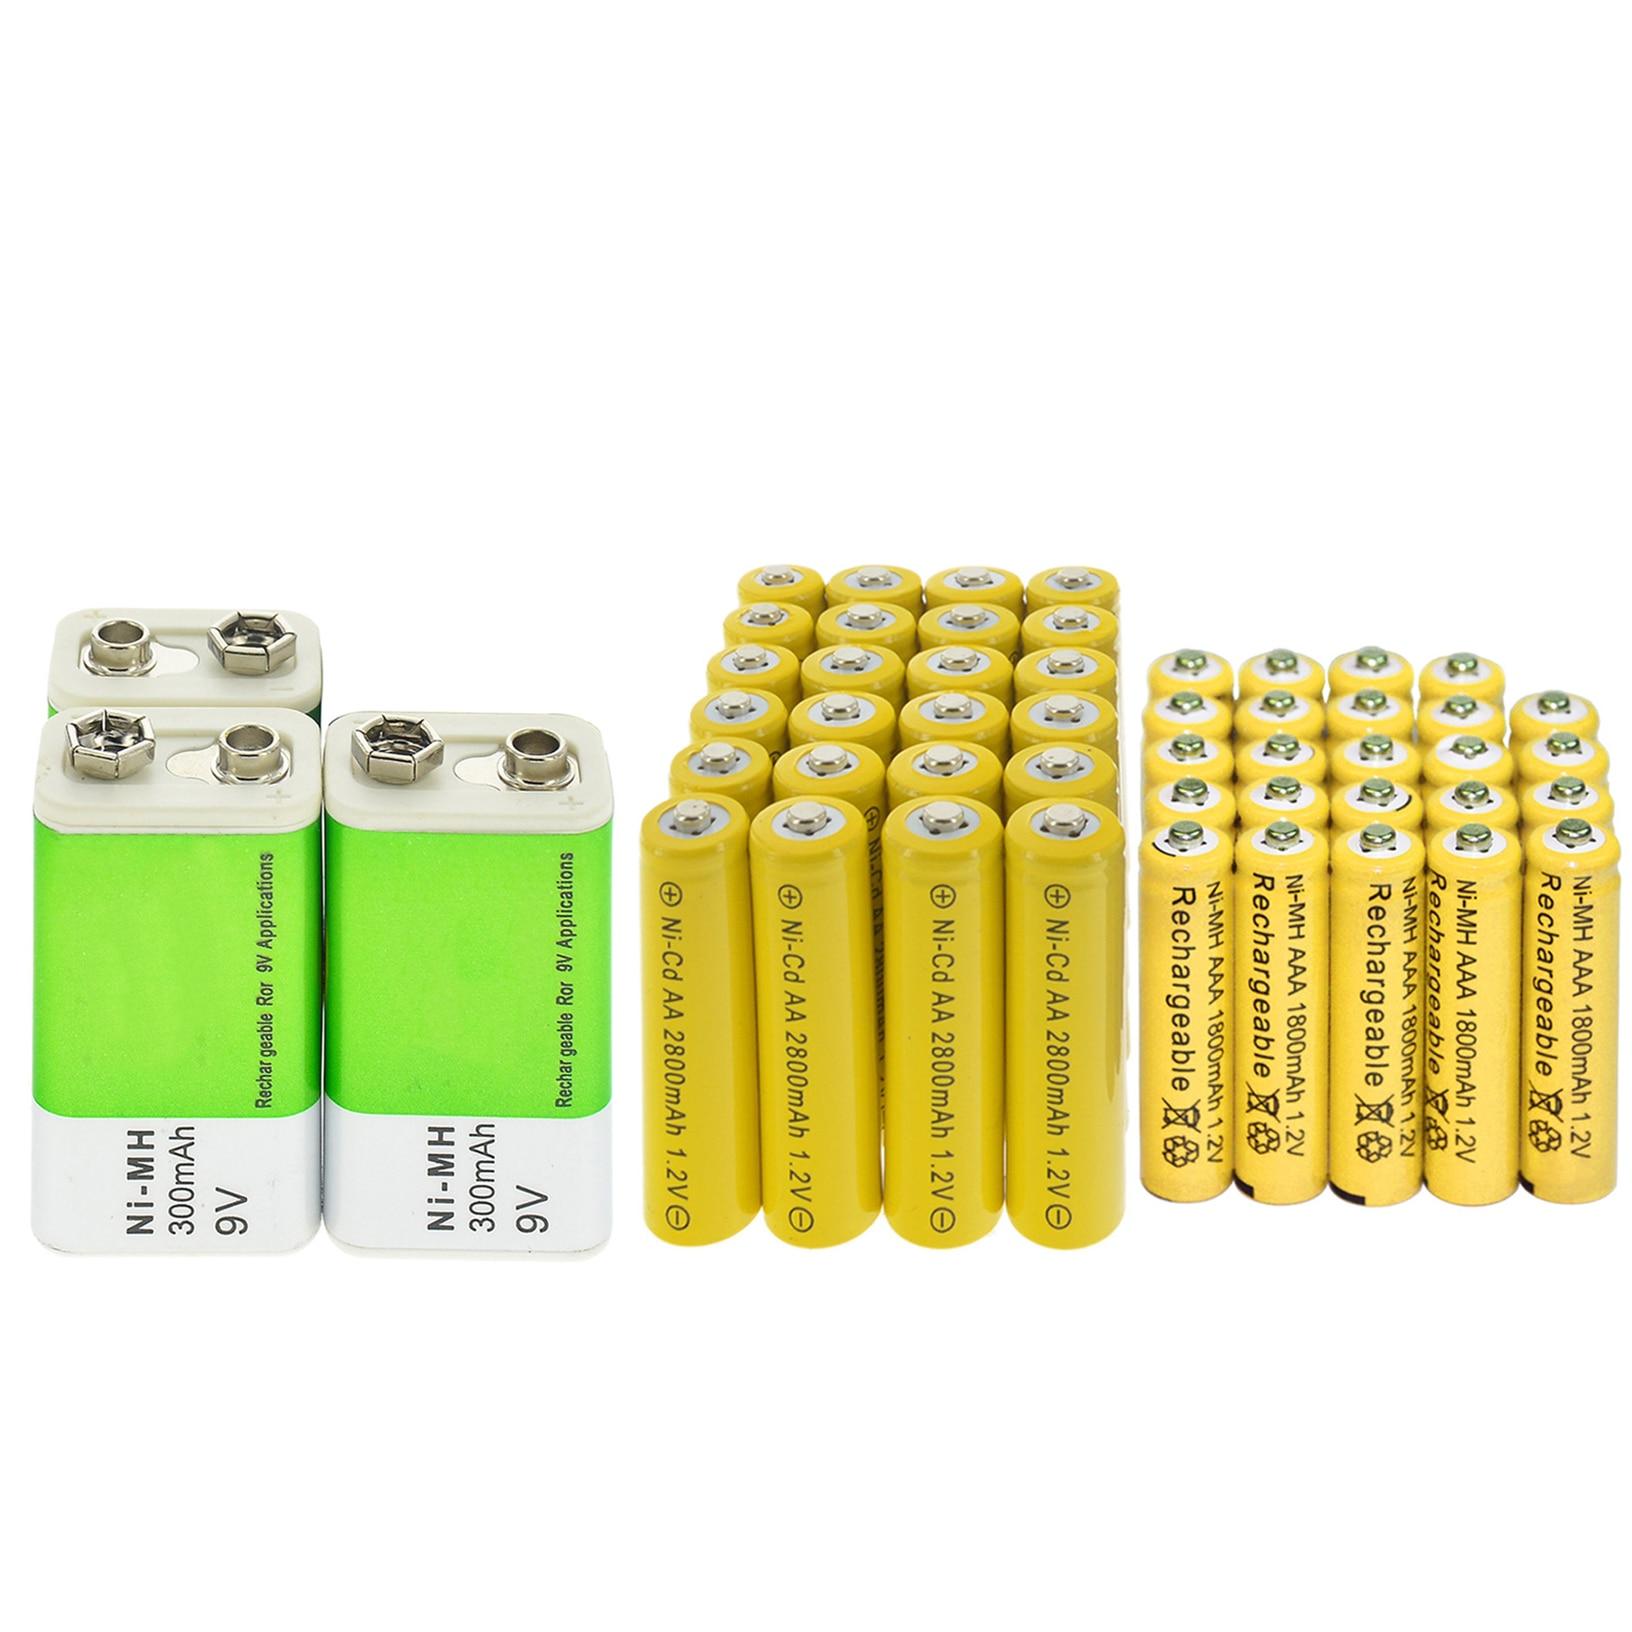 9v 300mAh+AA Ni-Cd 2800mAh+AAA NI-MH 1800mAh 1.2V Rechargeable Battery yellow